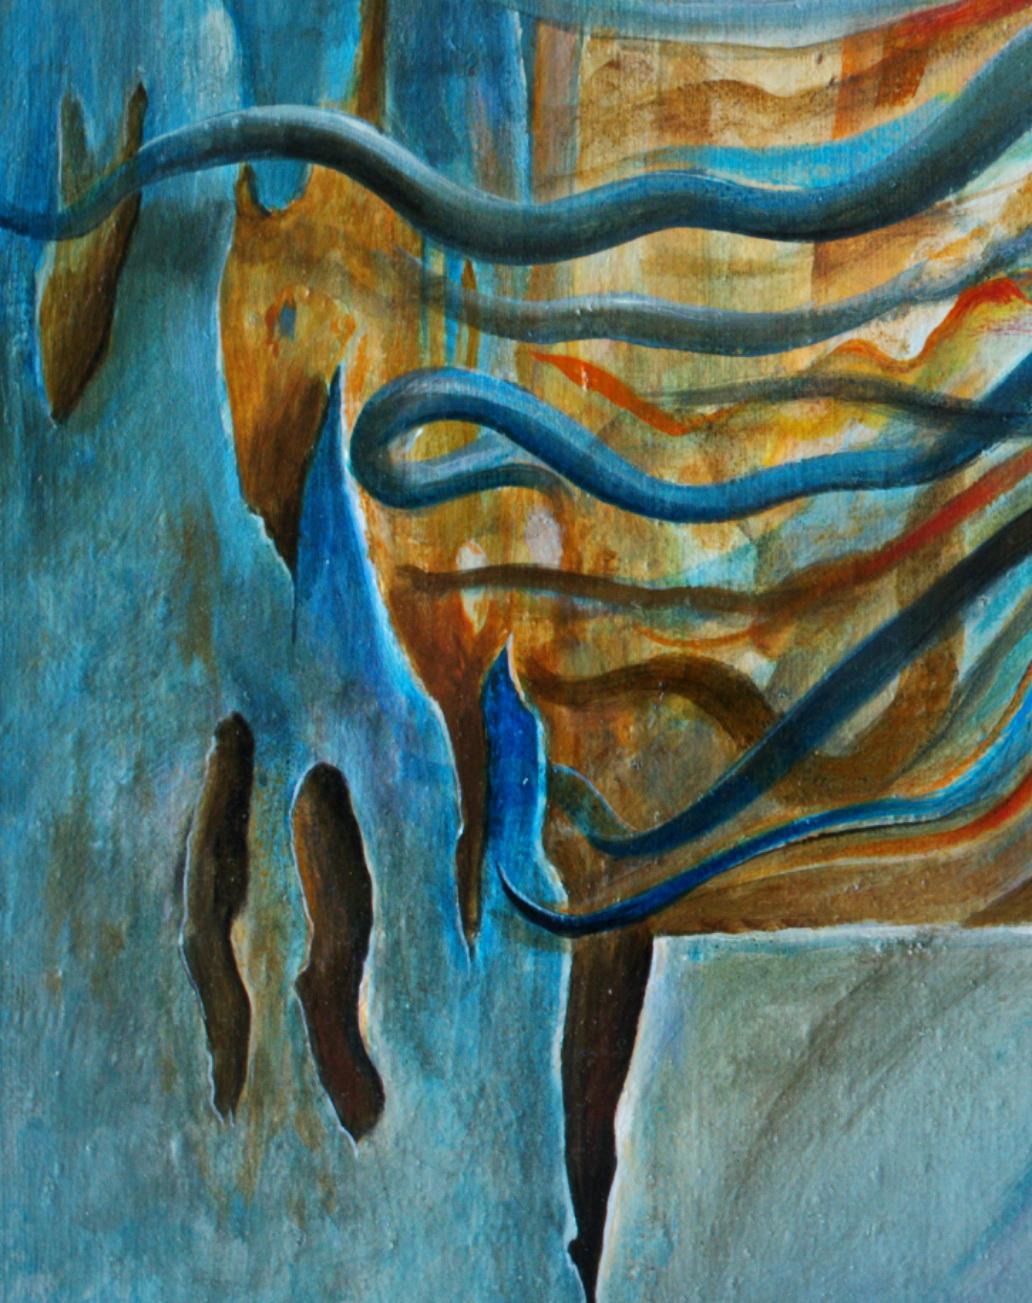 ART_paint_Im_watching_you_03